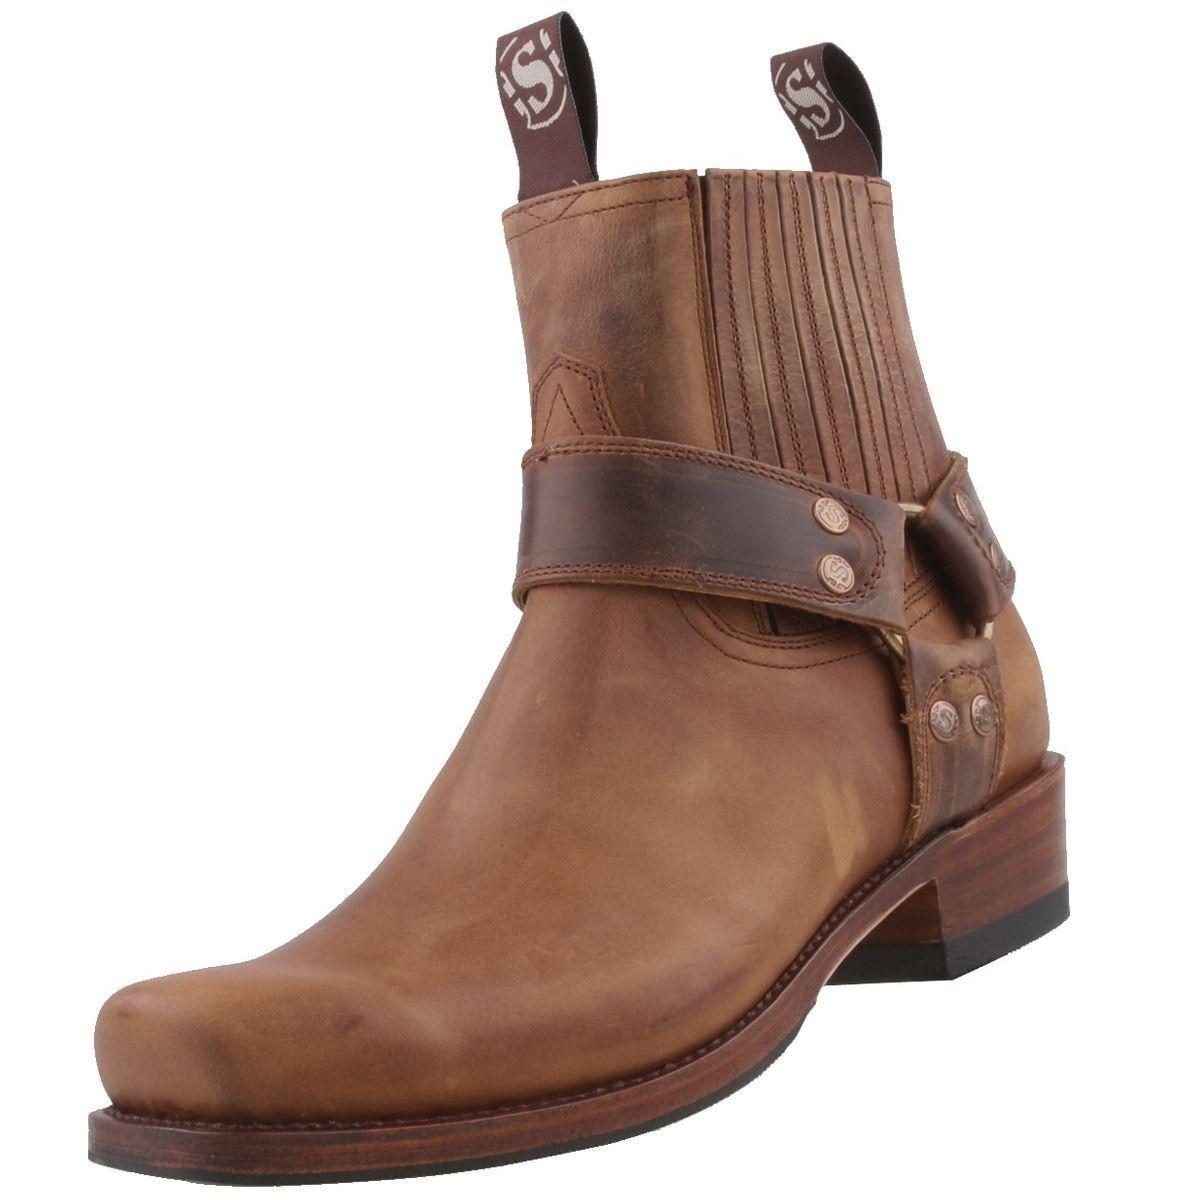 Nuevo sendra botas zapatos caballero zapatos cuero-botas motorista-botas botines